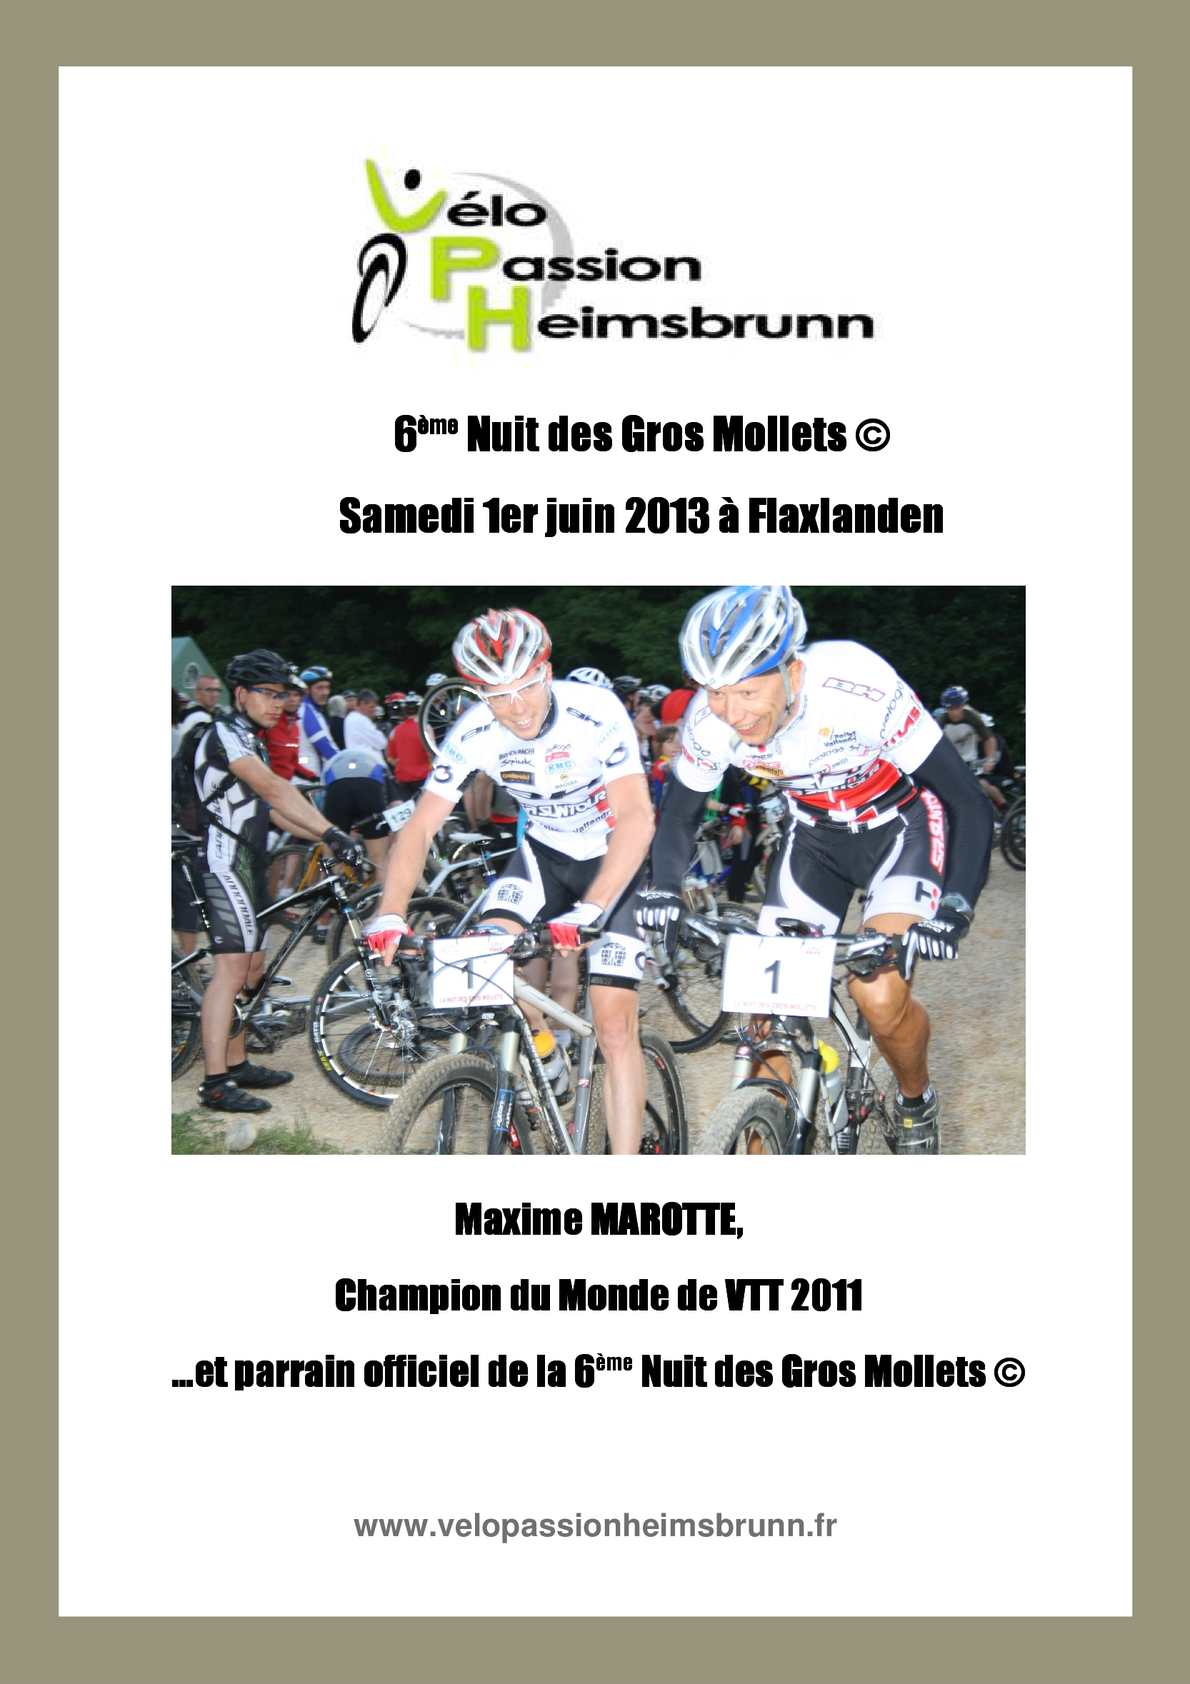 Salle De Sport Flaxlanden calaméo - book_sponsoring_gros mollets_2013_v2 (1)